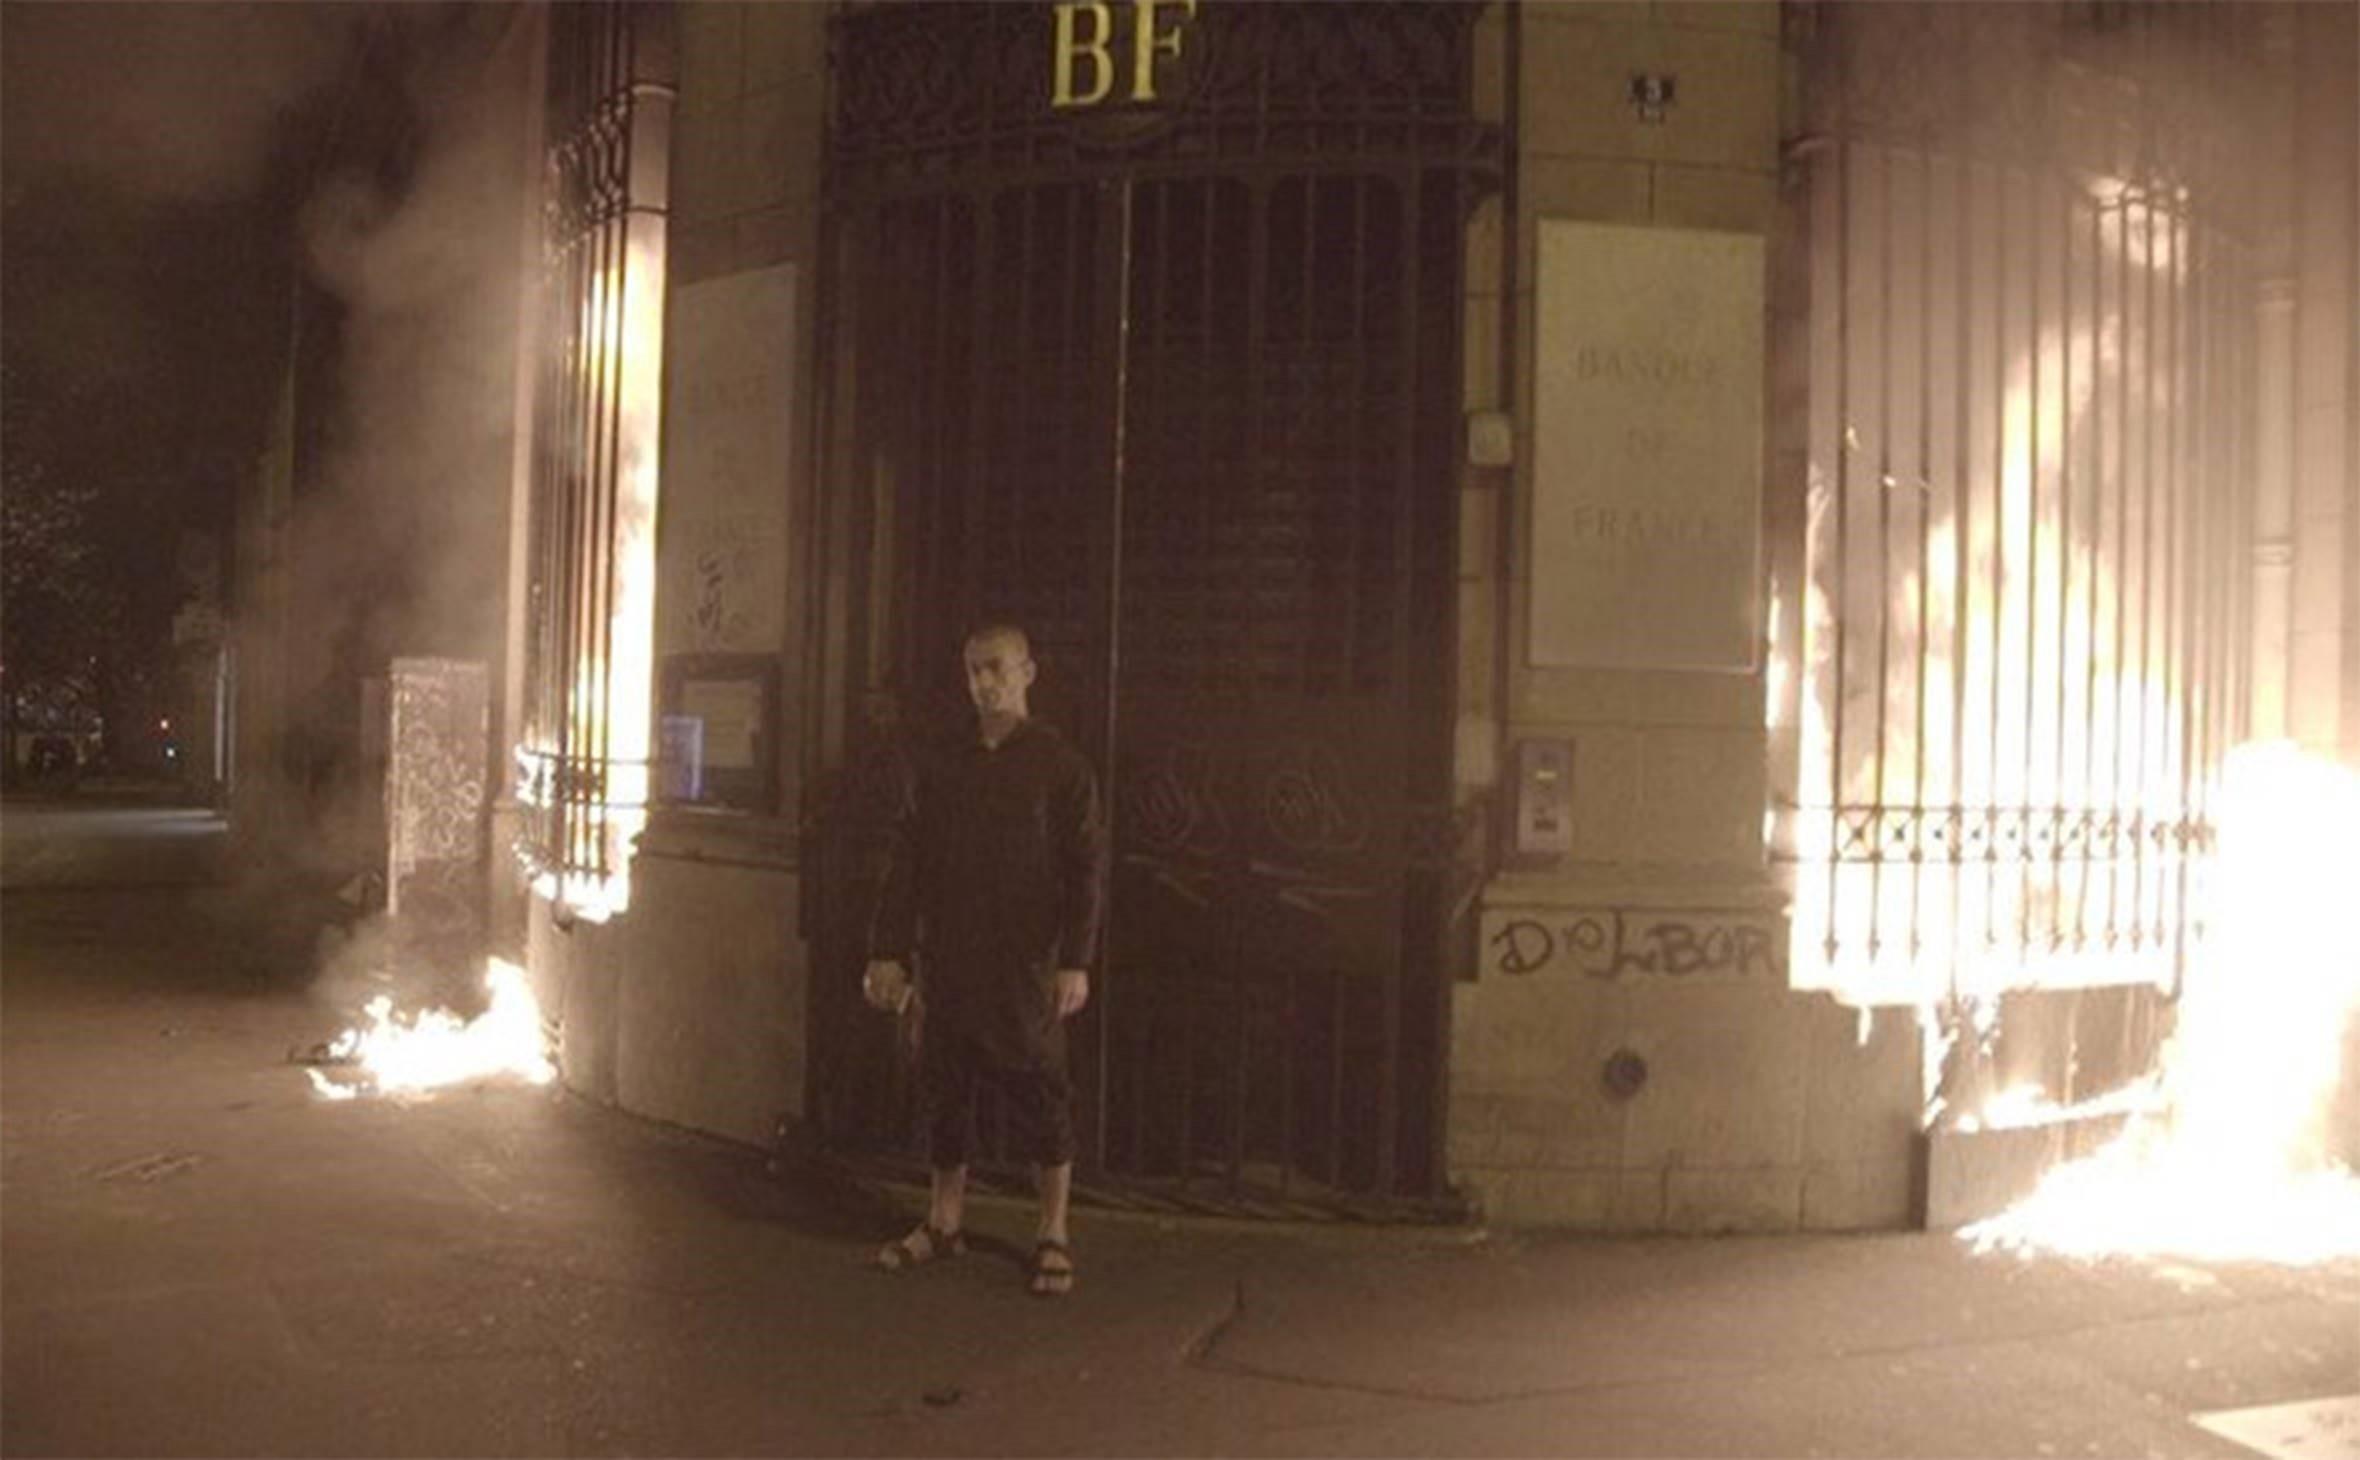 Petr Pavlensky in front of the Banque De France